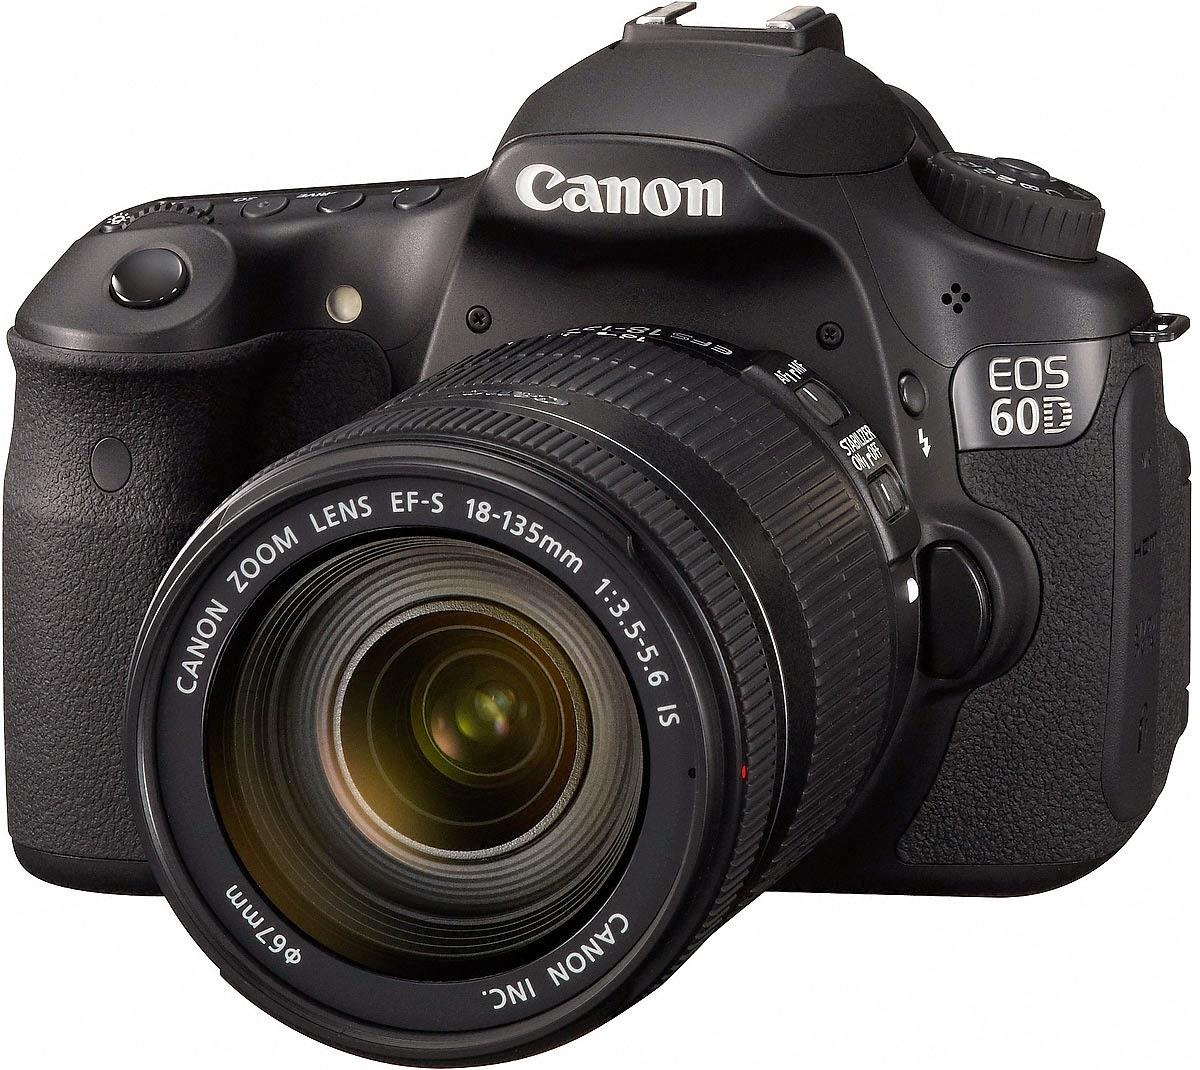 Canon EOS 60D DSLR Digital Camera